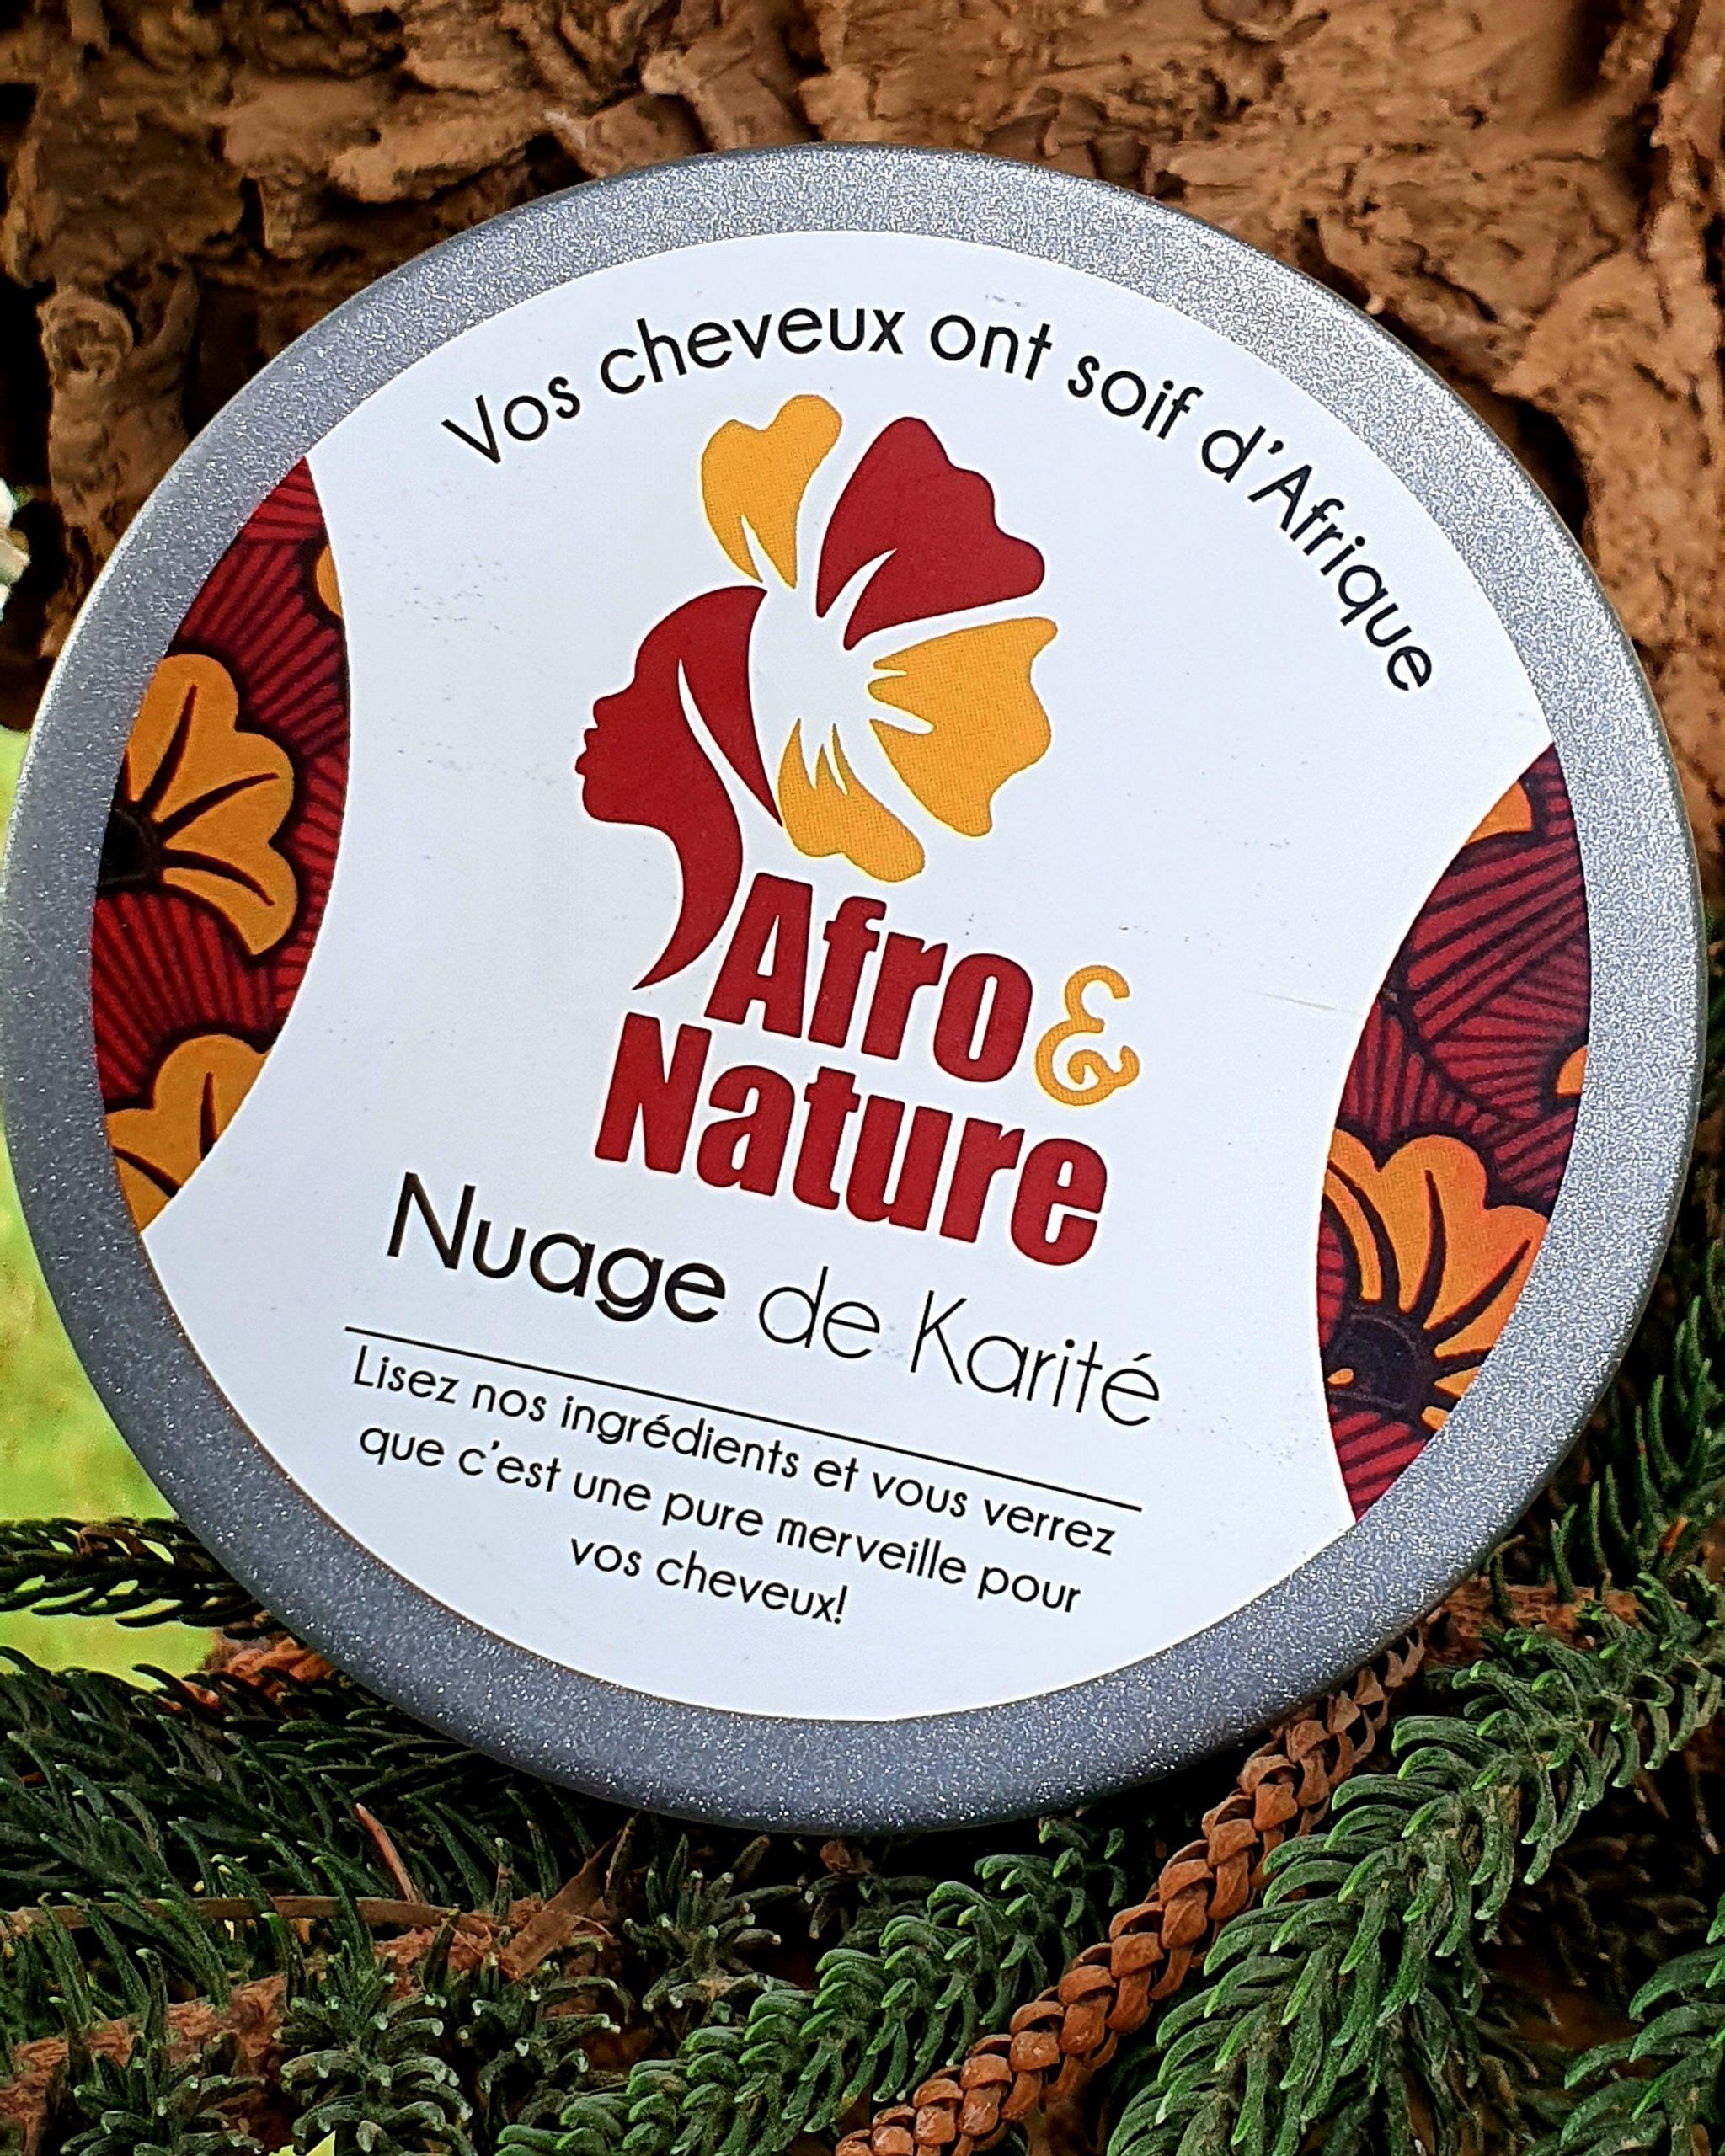 afro et nature